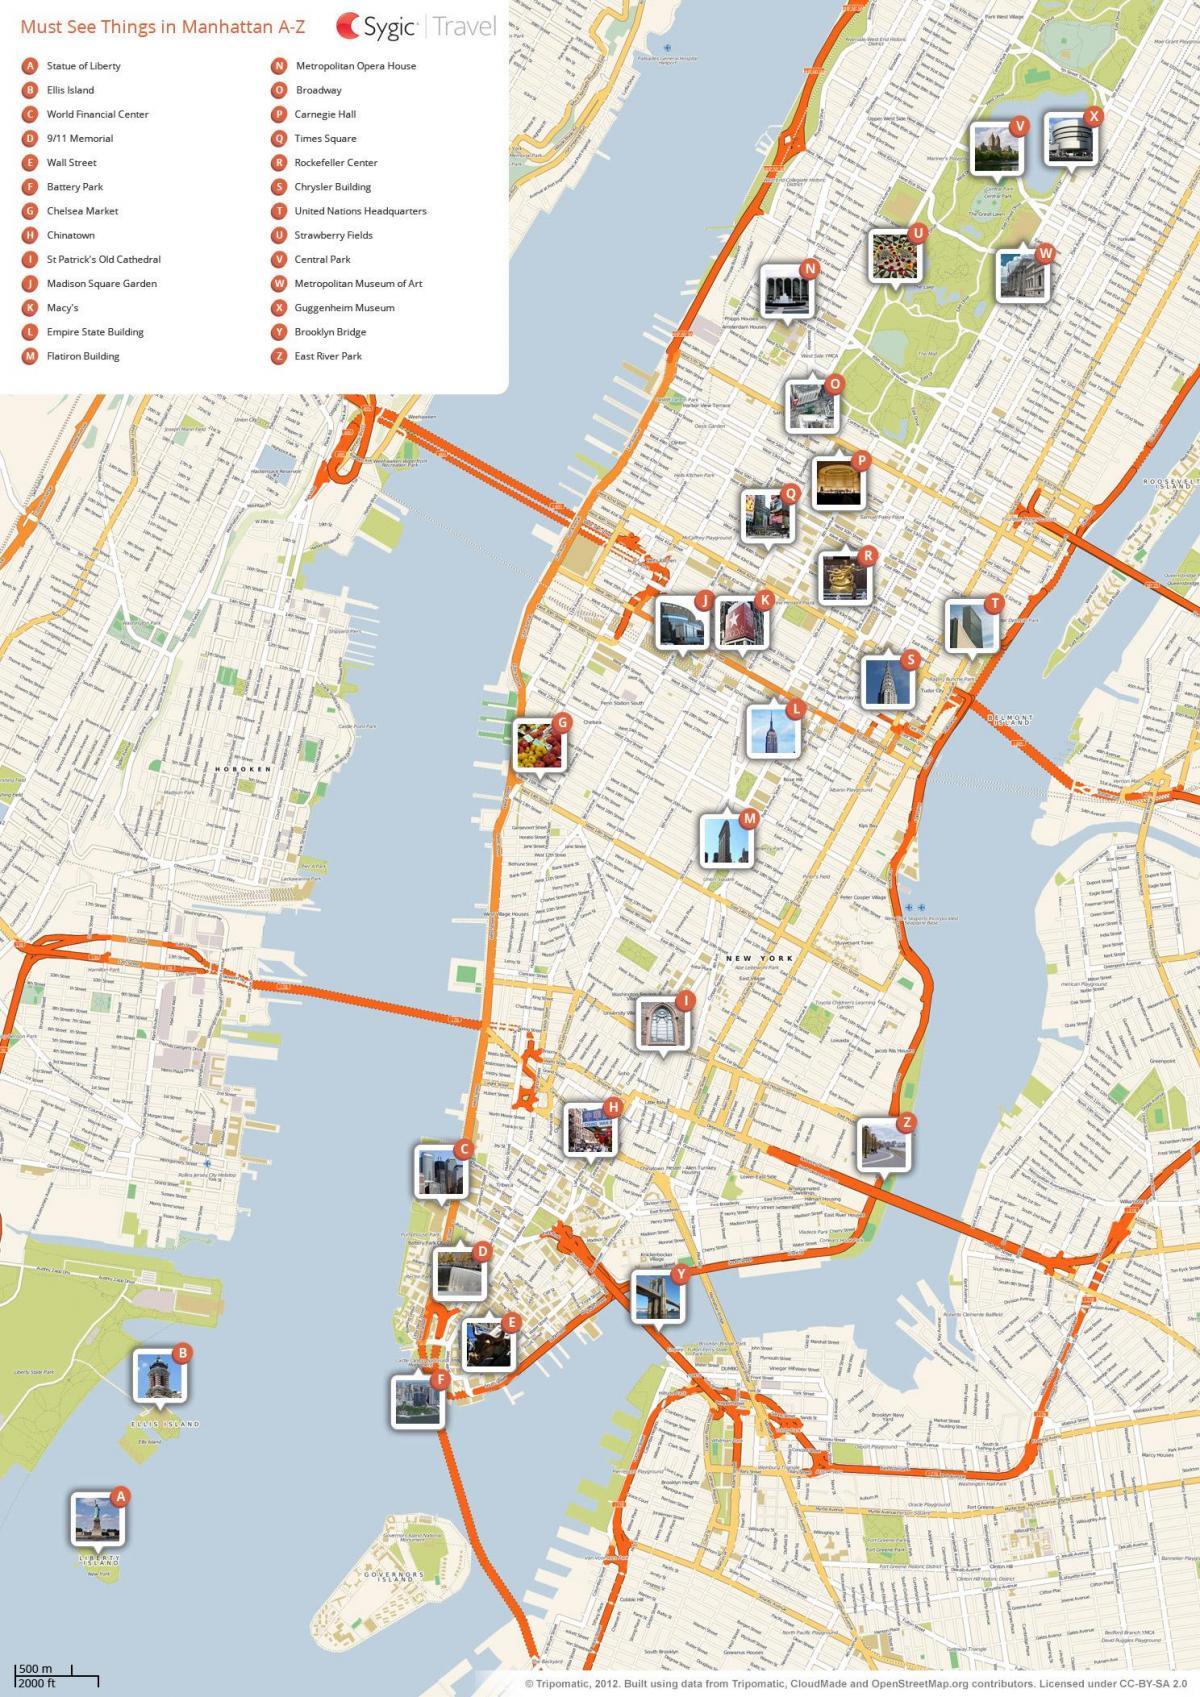 sevärdheter new york karta NYC turist karta   New York City sevärdheter karta (New York   USA) sevärdheter new york karta